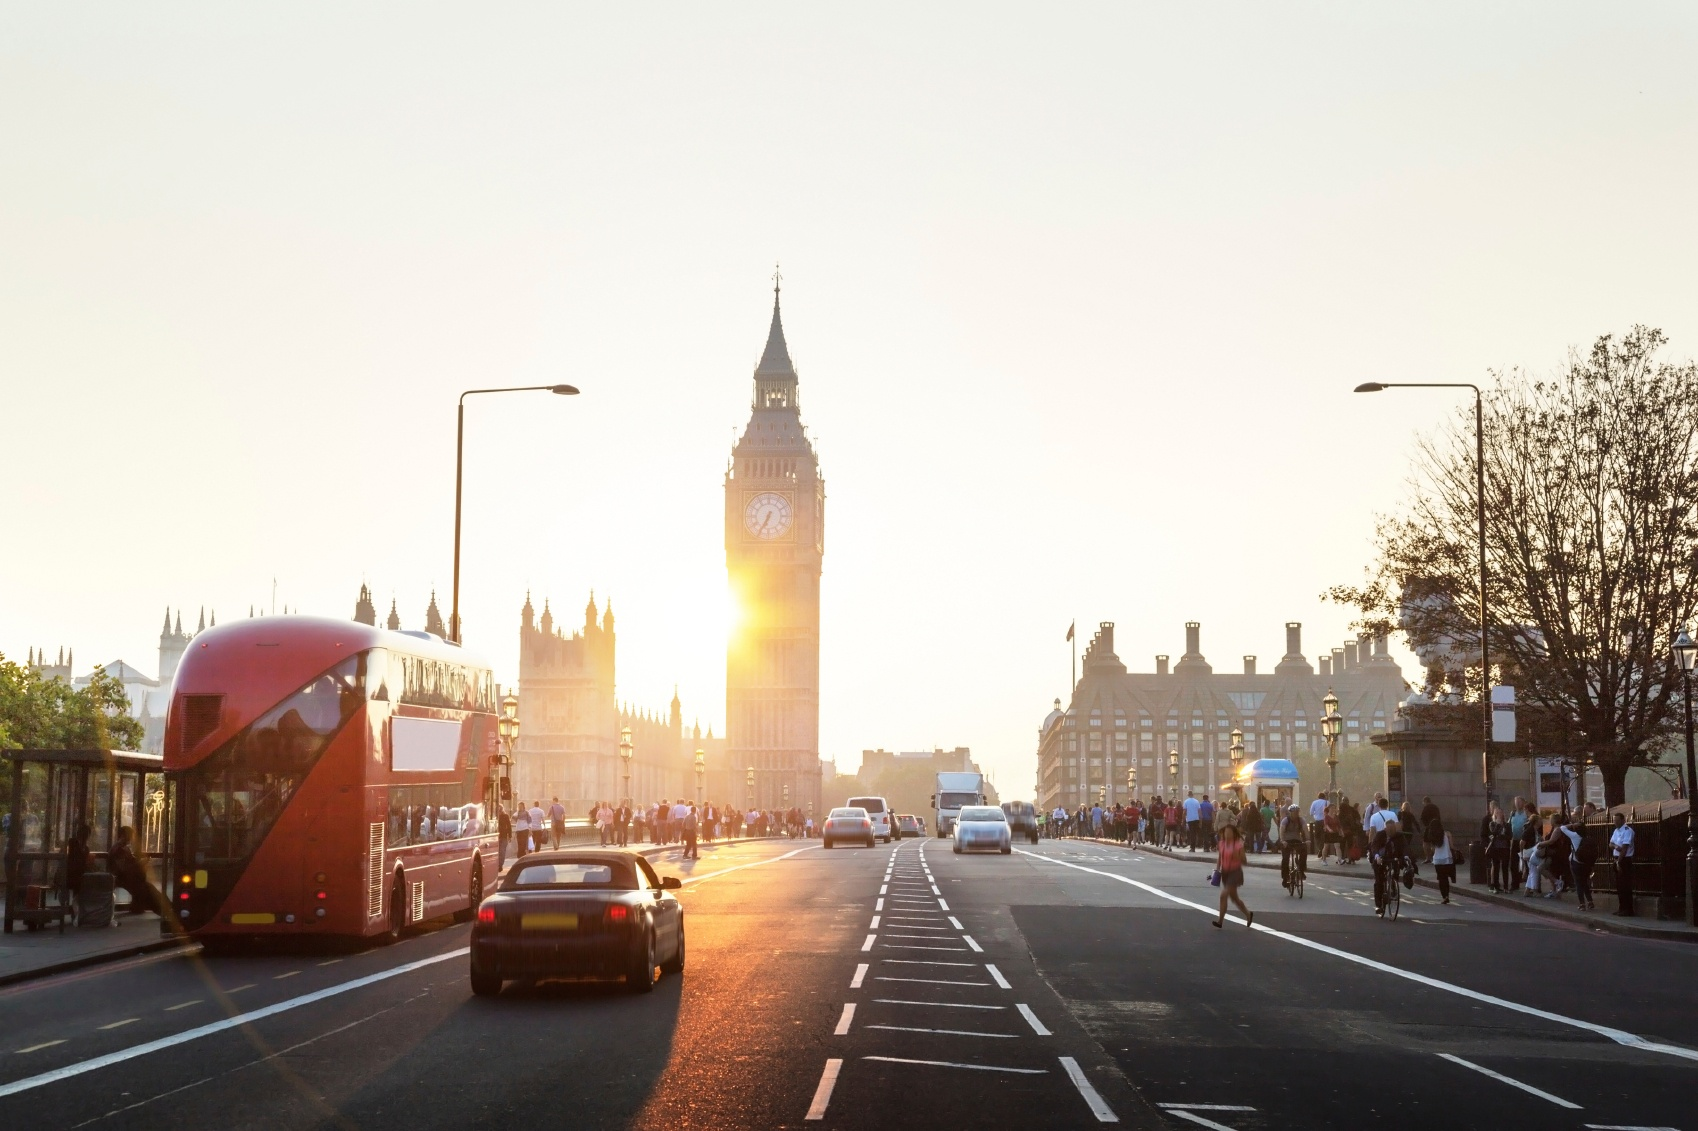 Westminster-Bridge-at-sunset-London-UK-000060726182_Medium.jpg